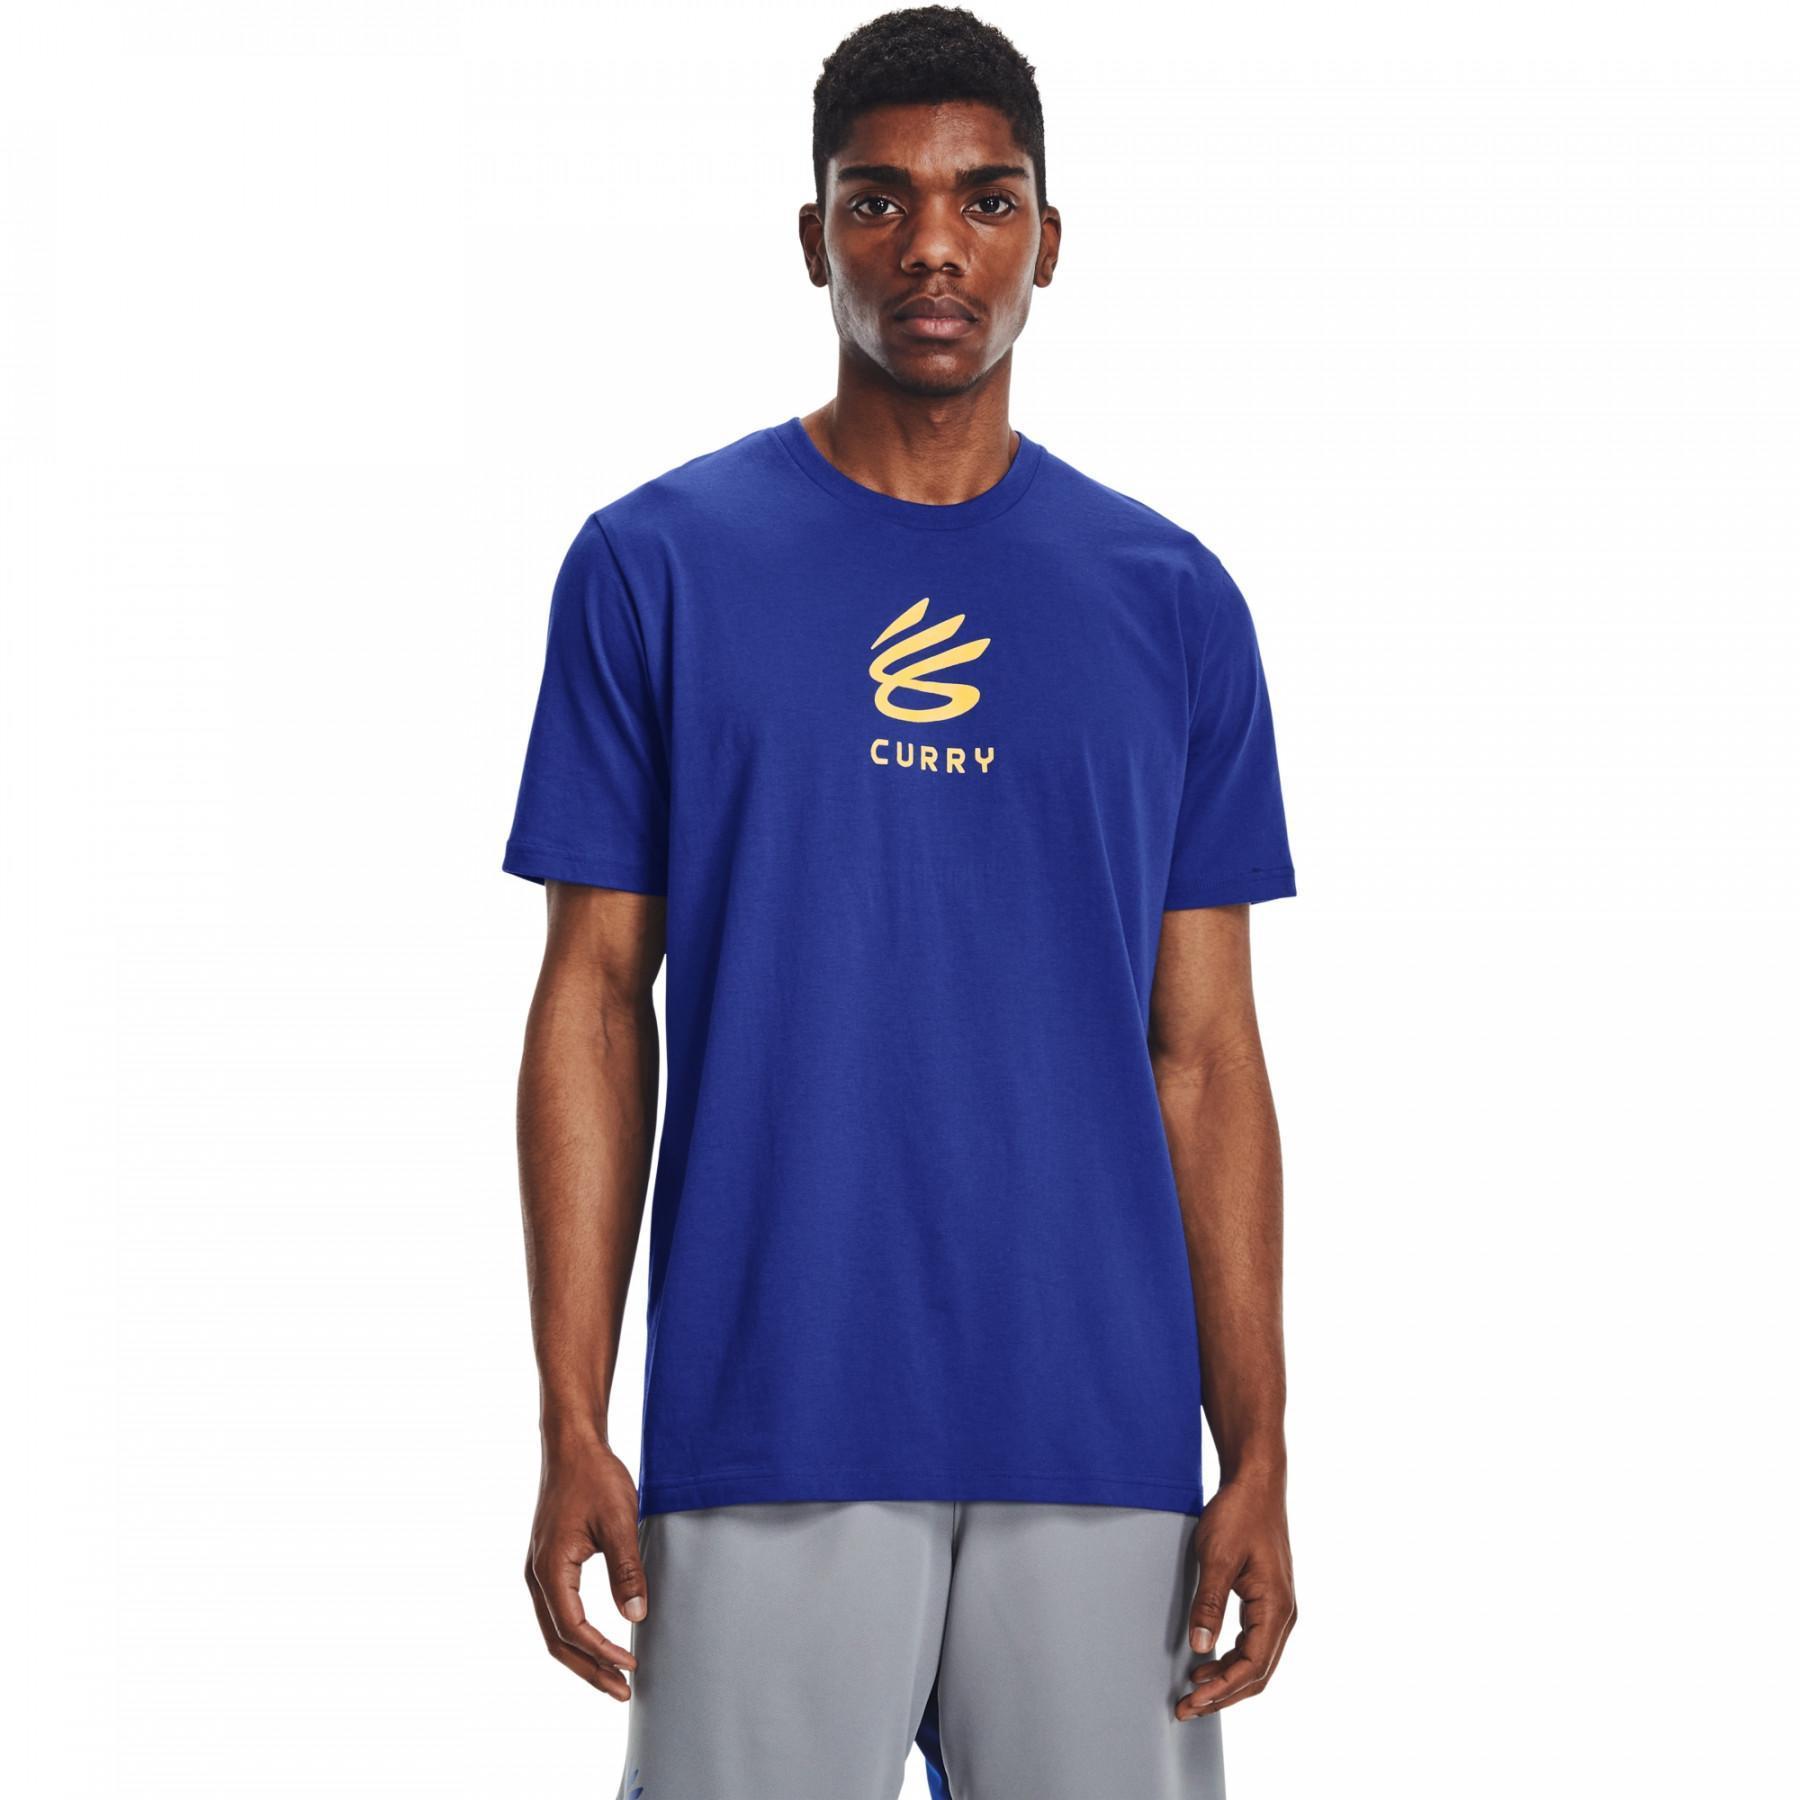 T-shirt Under Armour Curry Splash